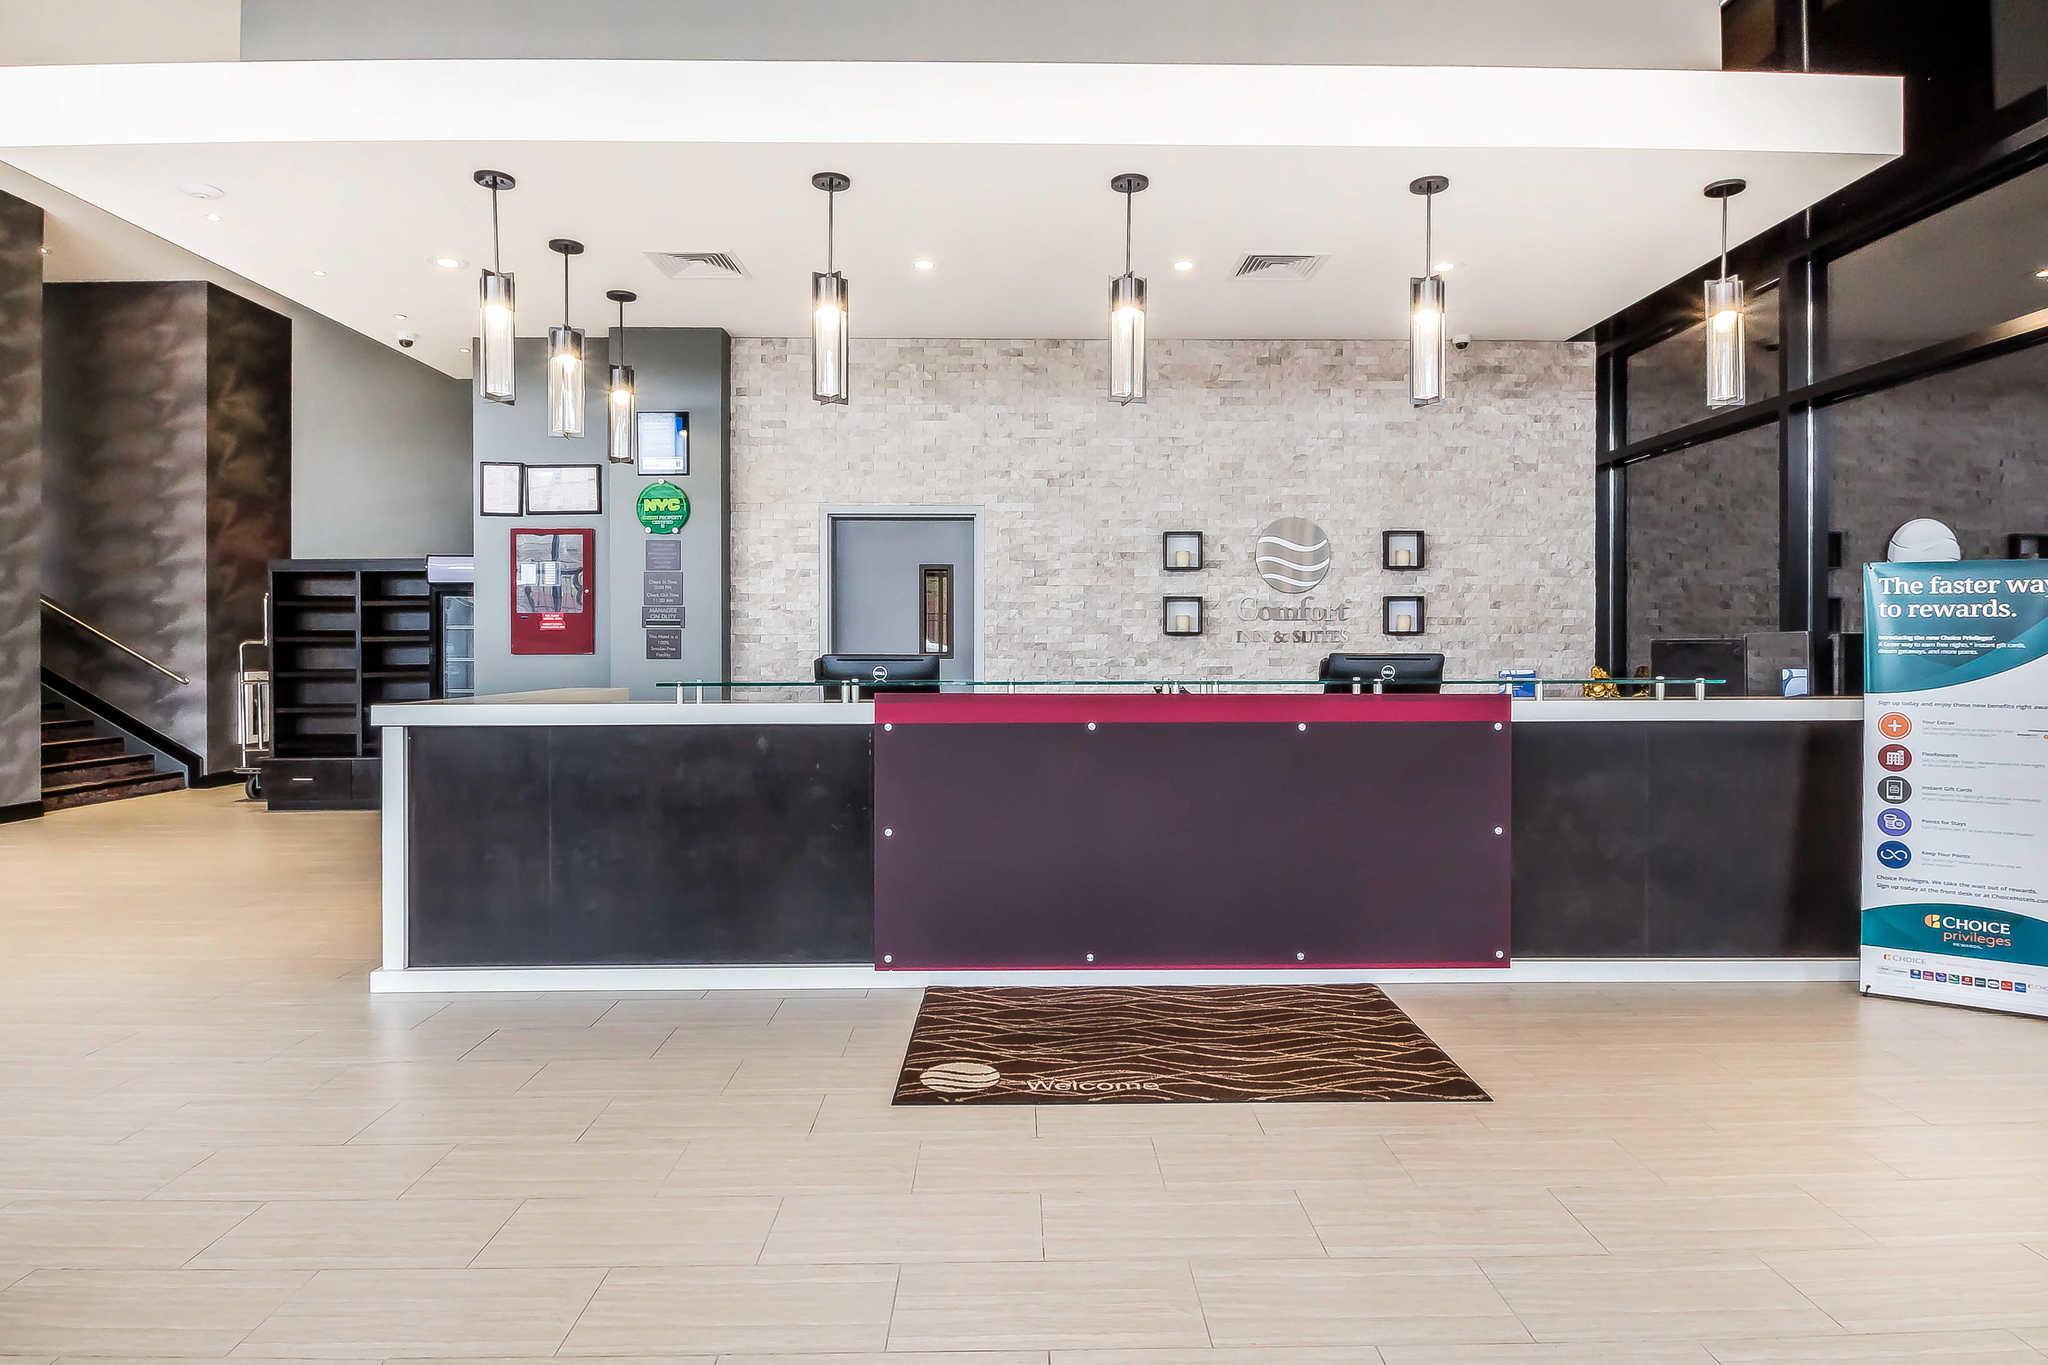 Comfort Inn & Suites near Stadium image 5